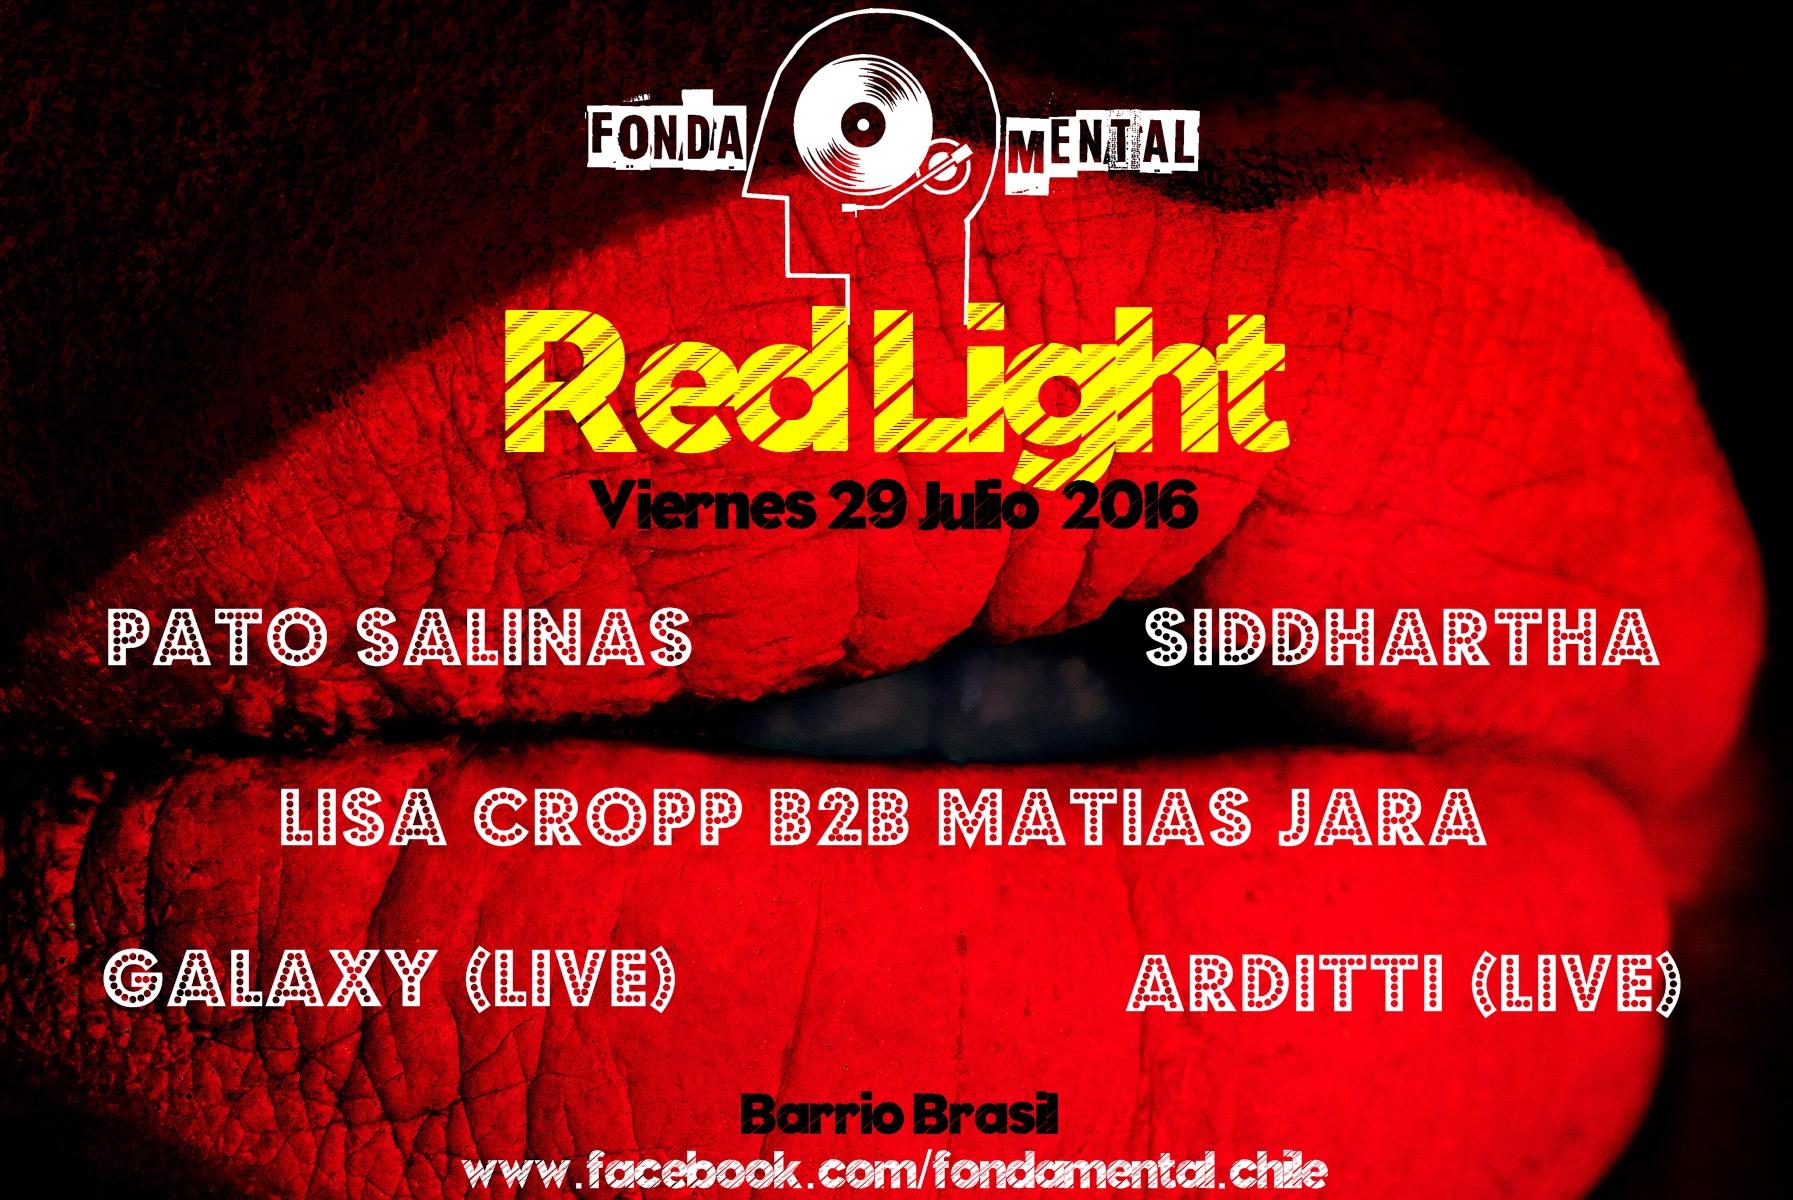 Lineredlight